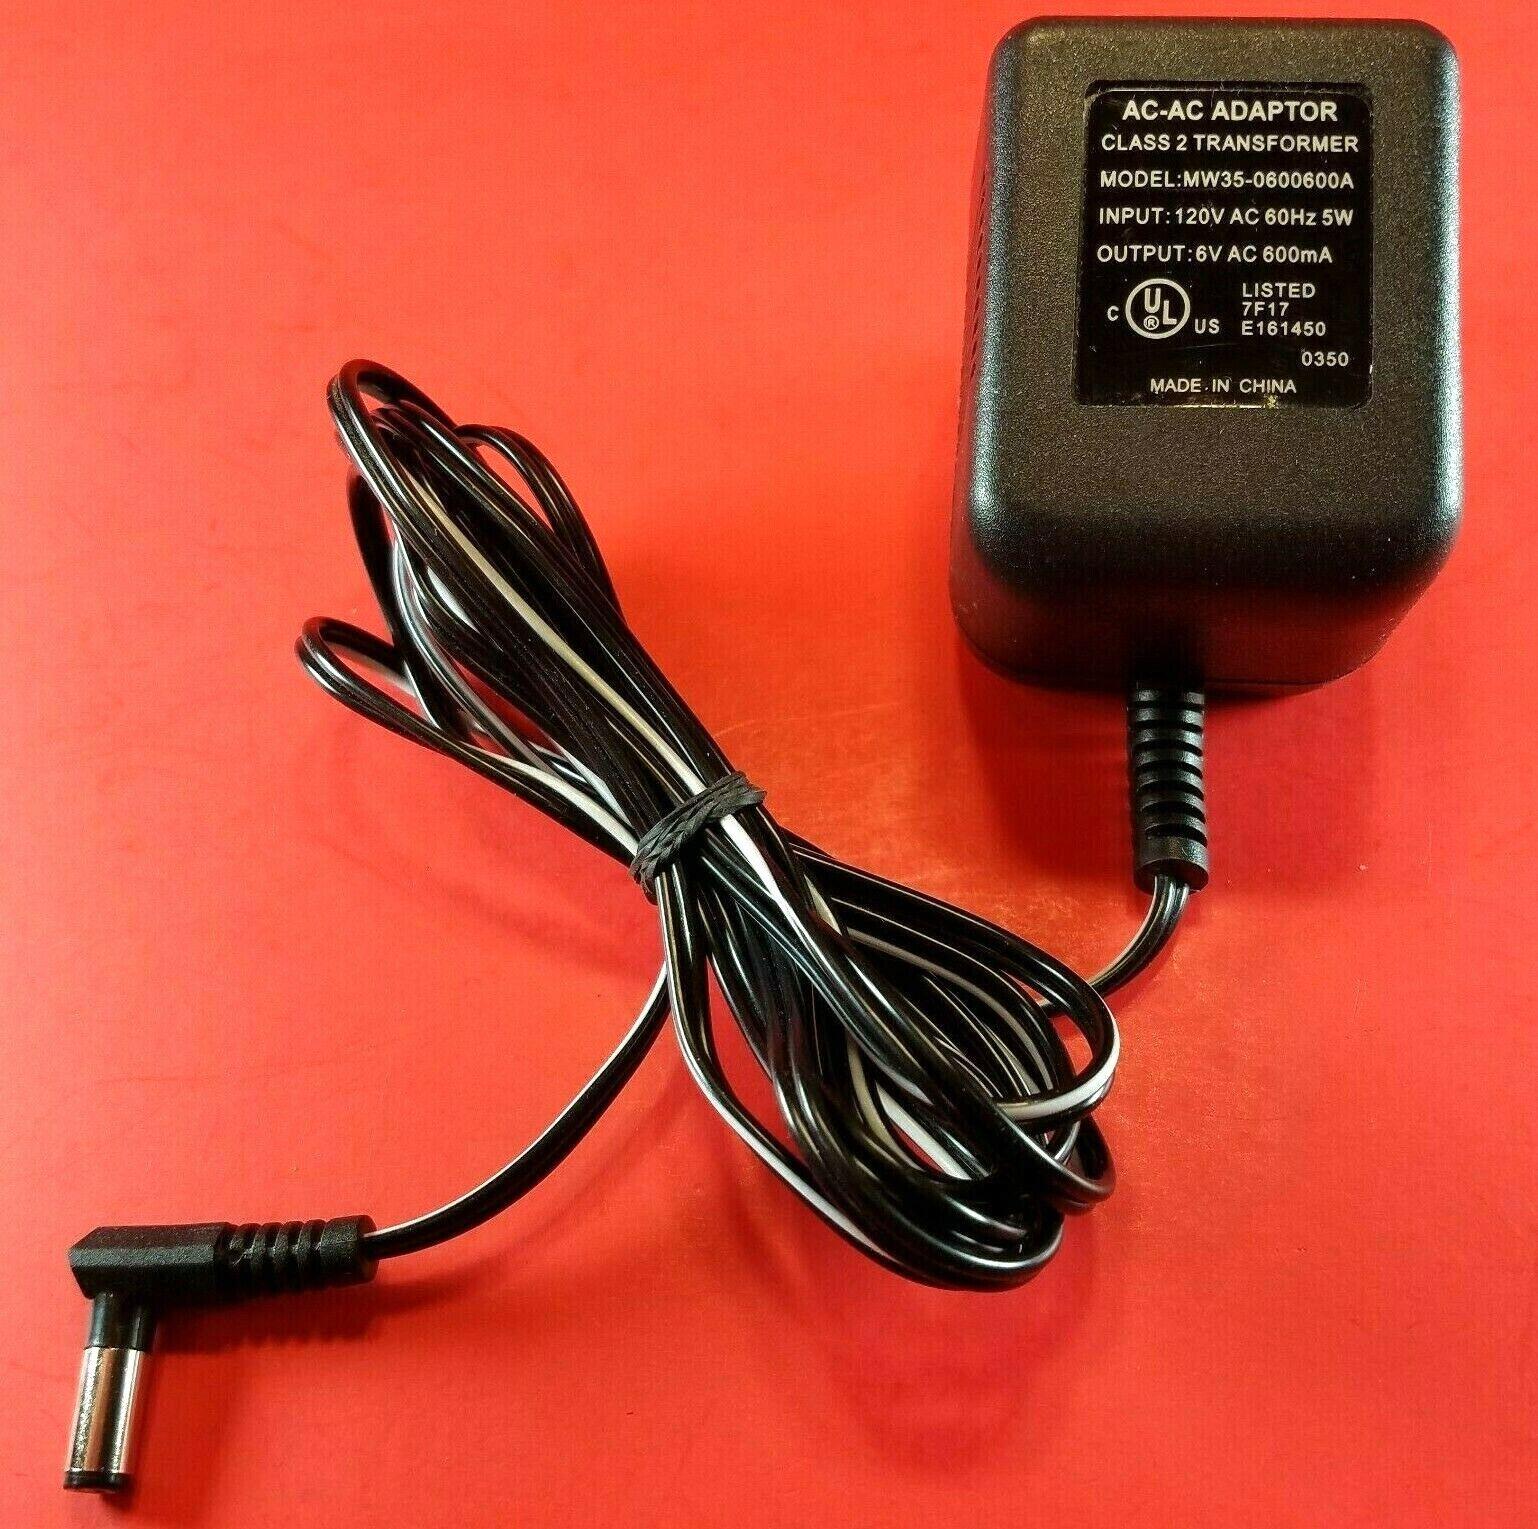 AC-AC Adapter MW35-0600600A Power Supply 6V - 600mA Adaptor Class 2 Transformer